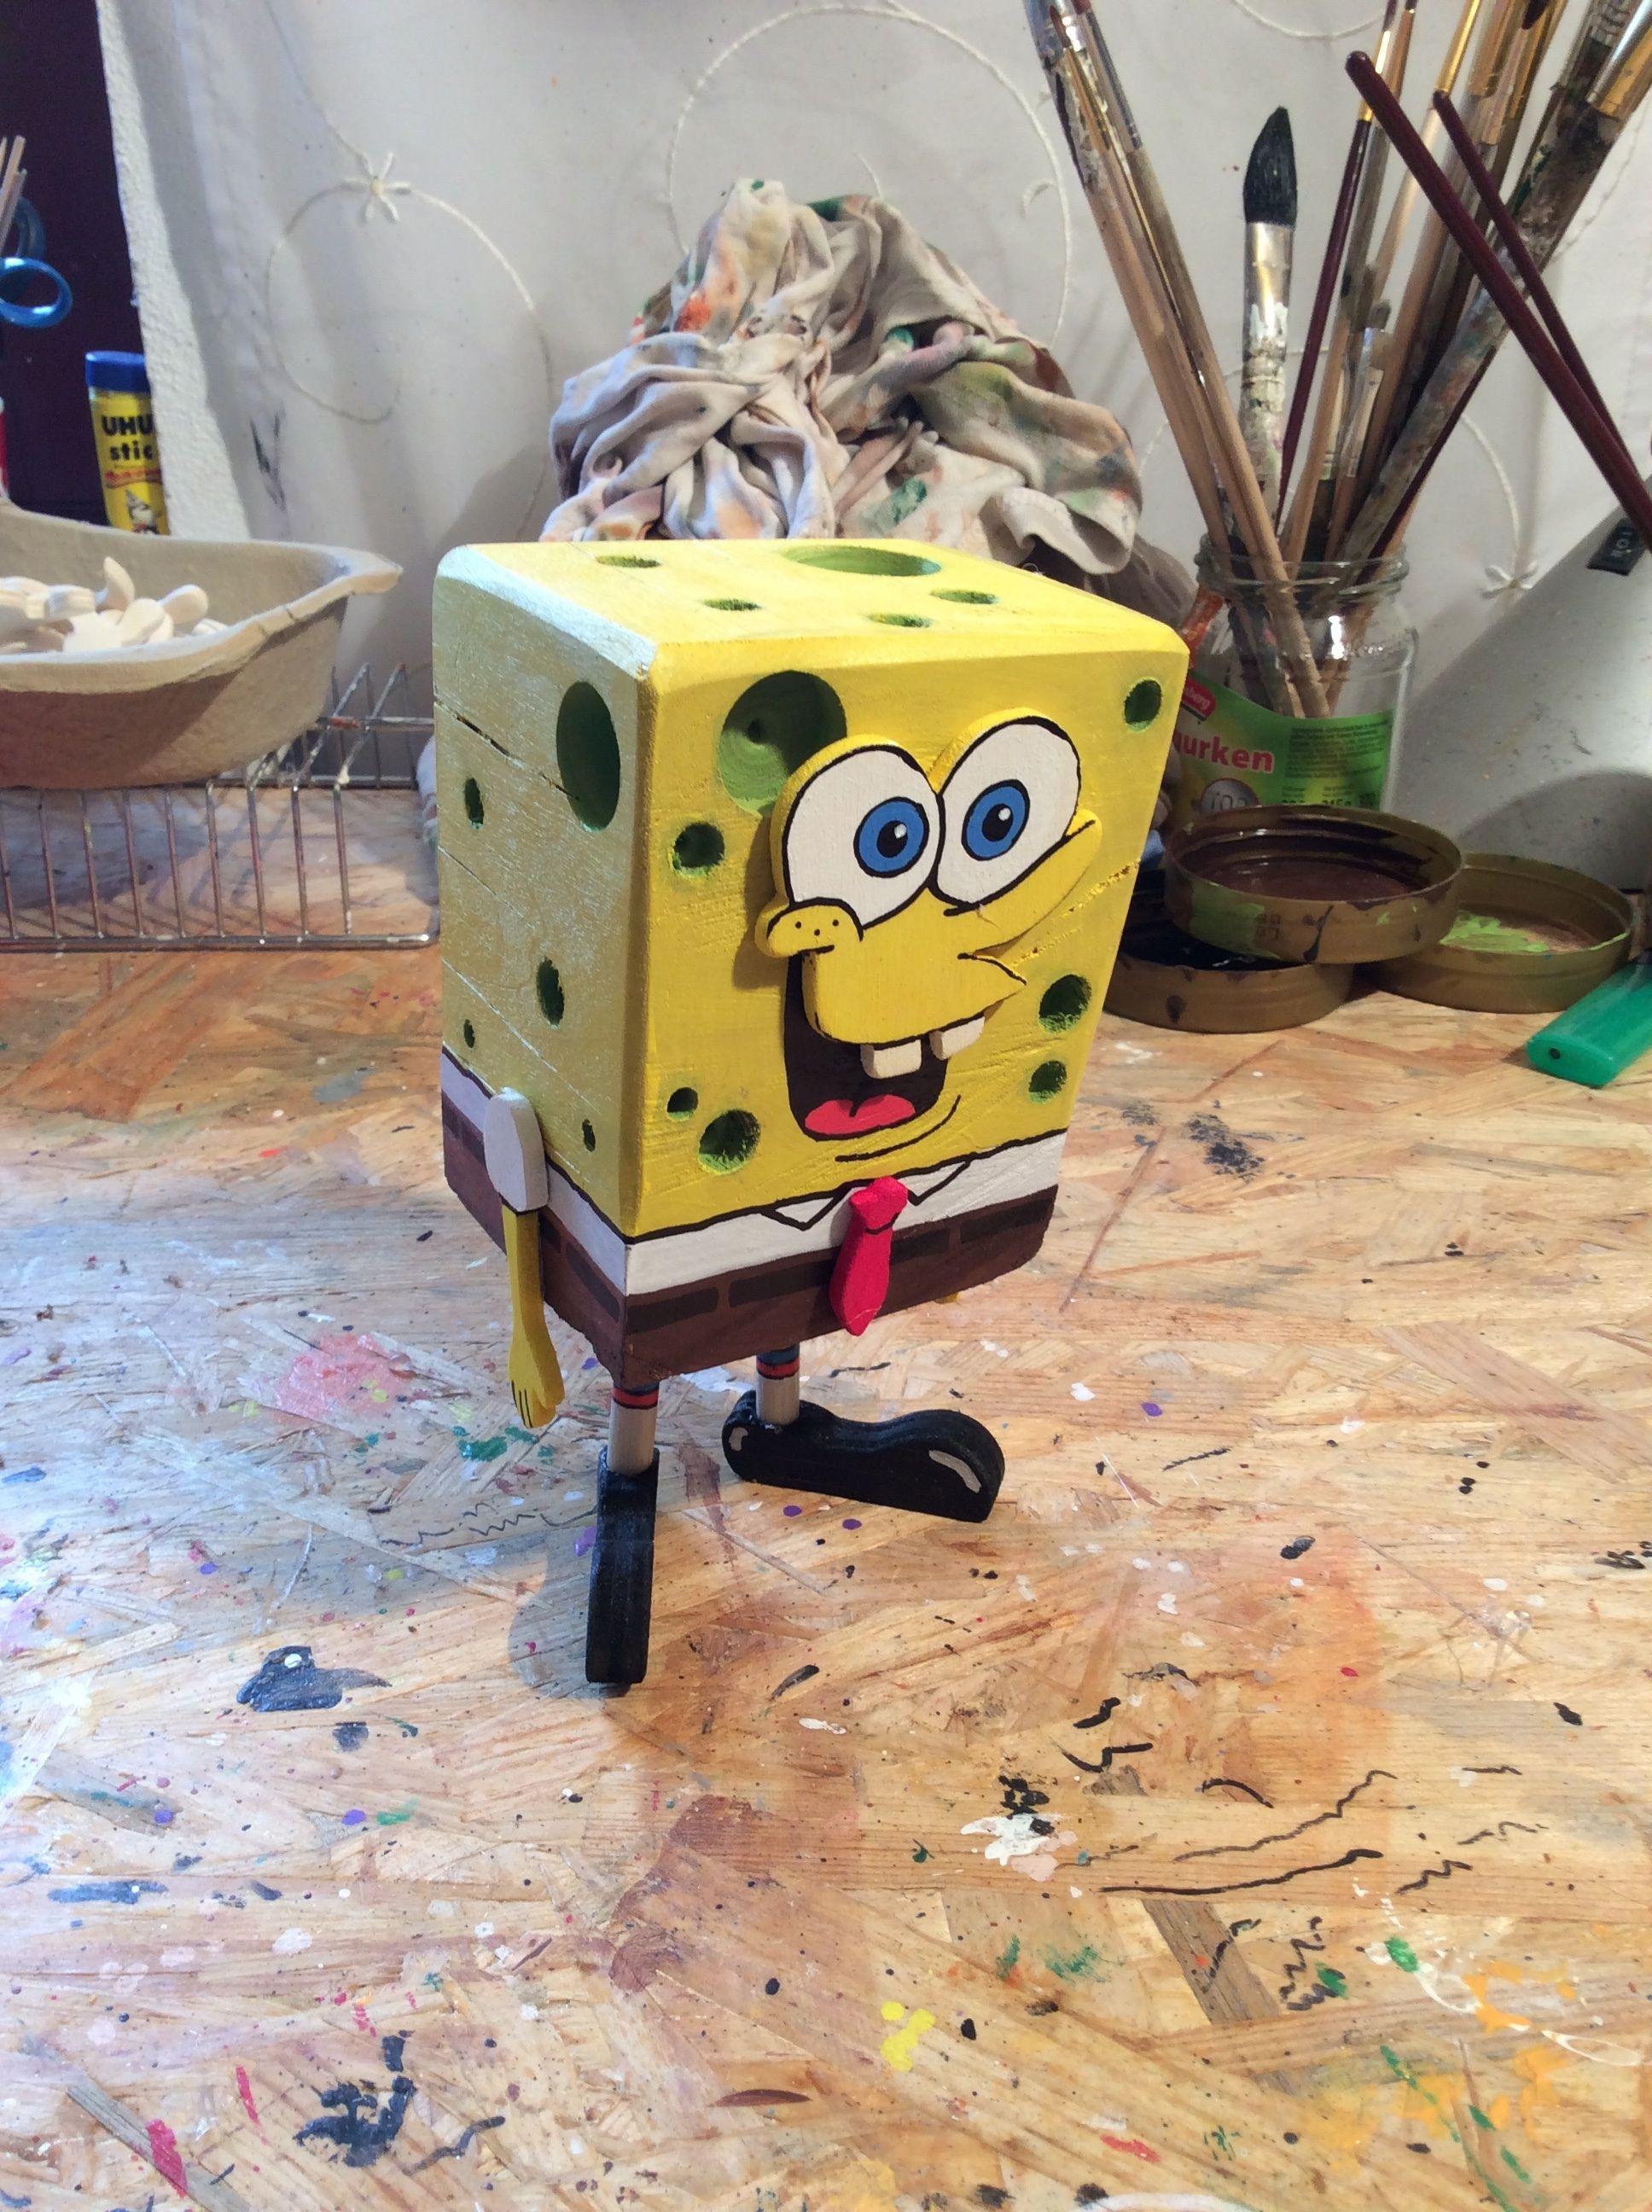 Holzfigur Und Holz Spongebob DiyHolztiereHolzfiguren bg7yYv6f